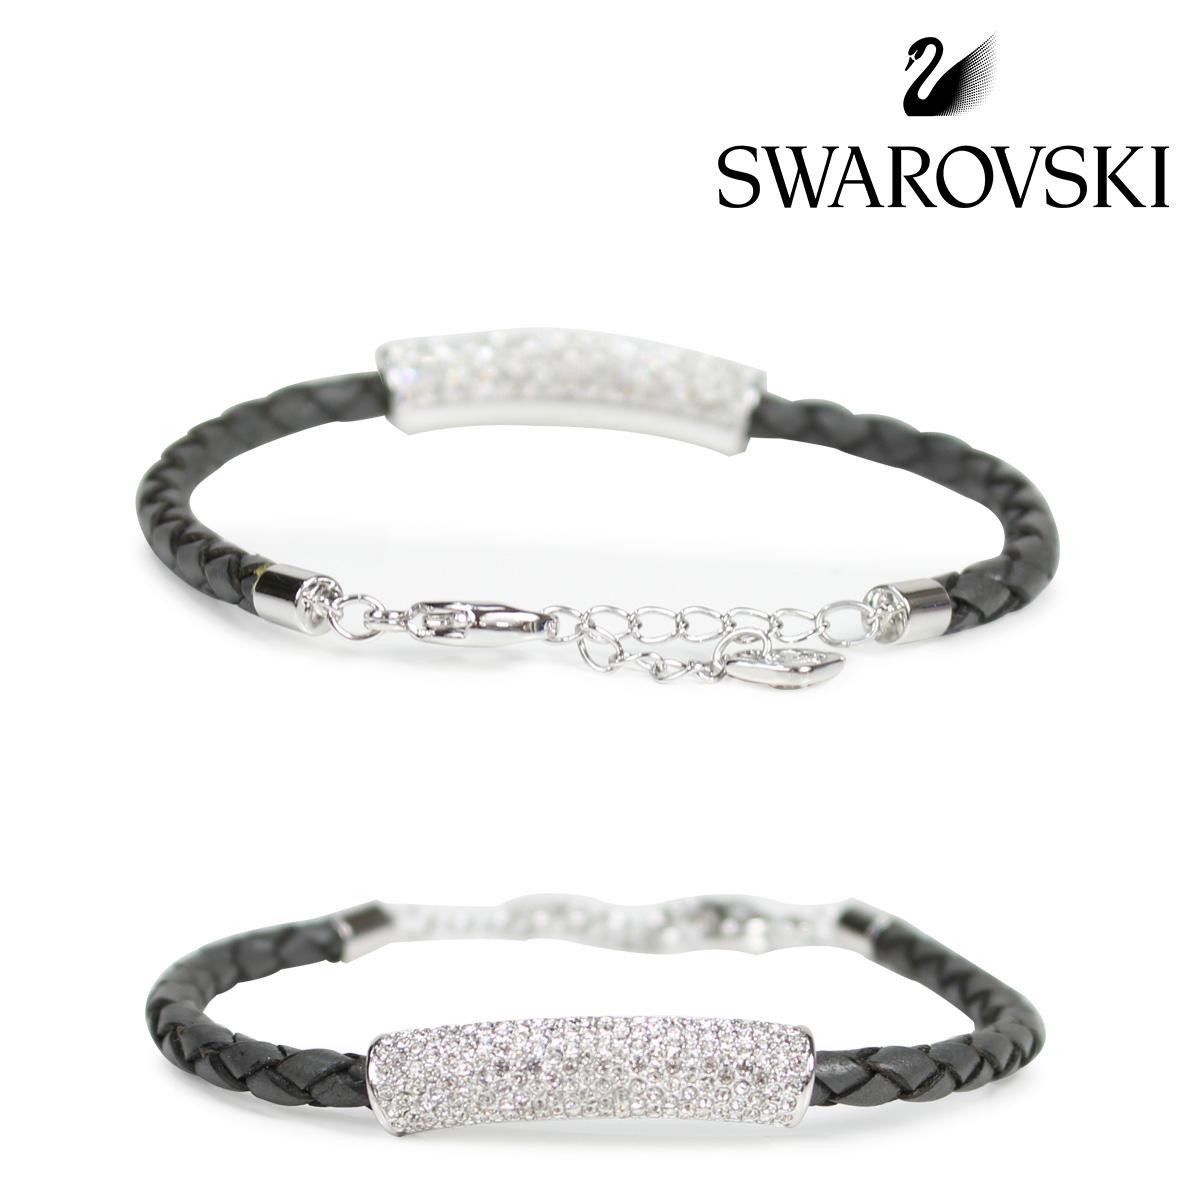 SWAROVSKI Swarovski bracelet Lady's STONE gray 5083363 M